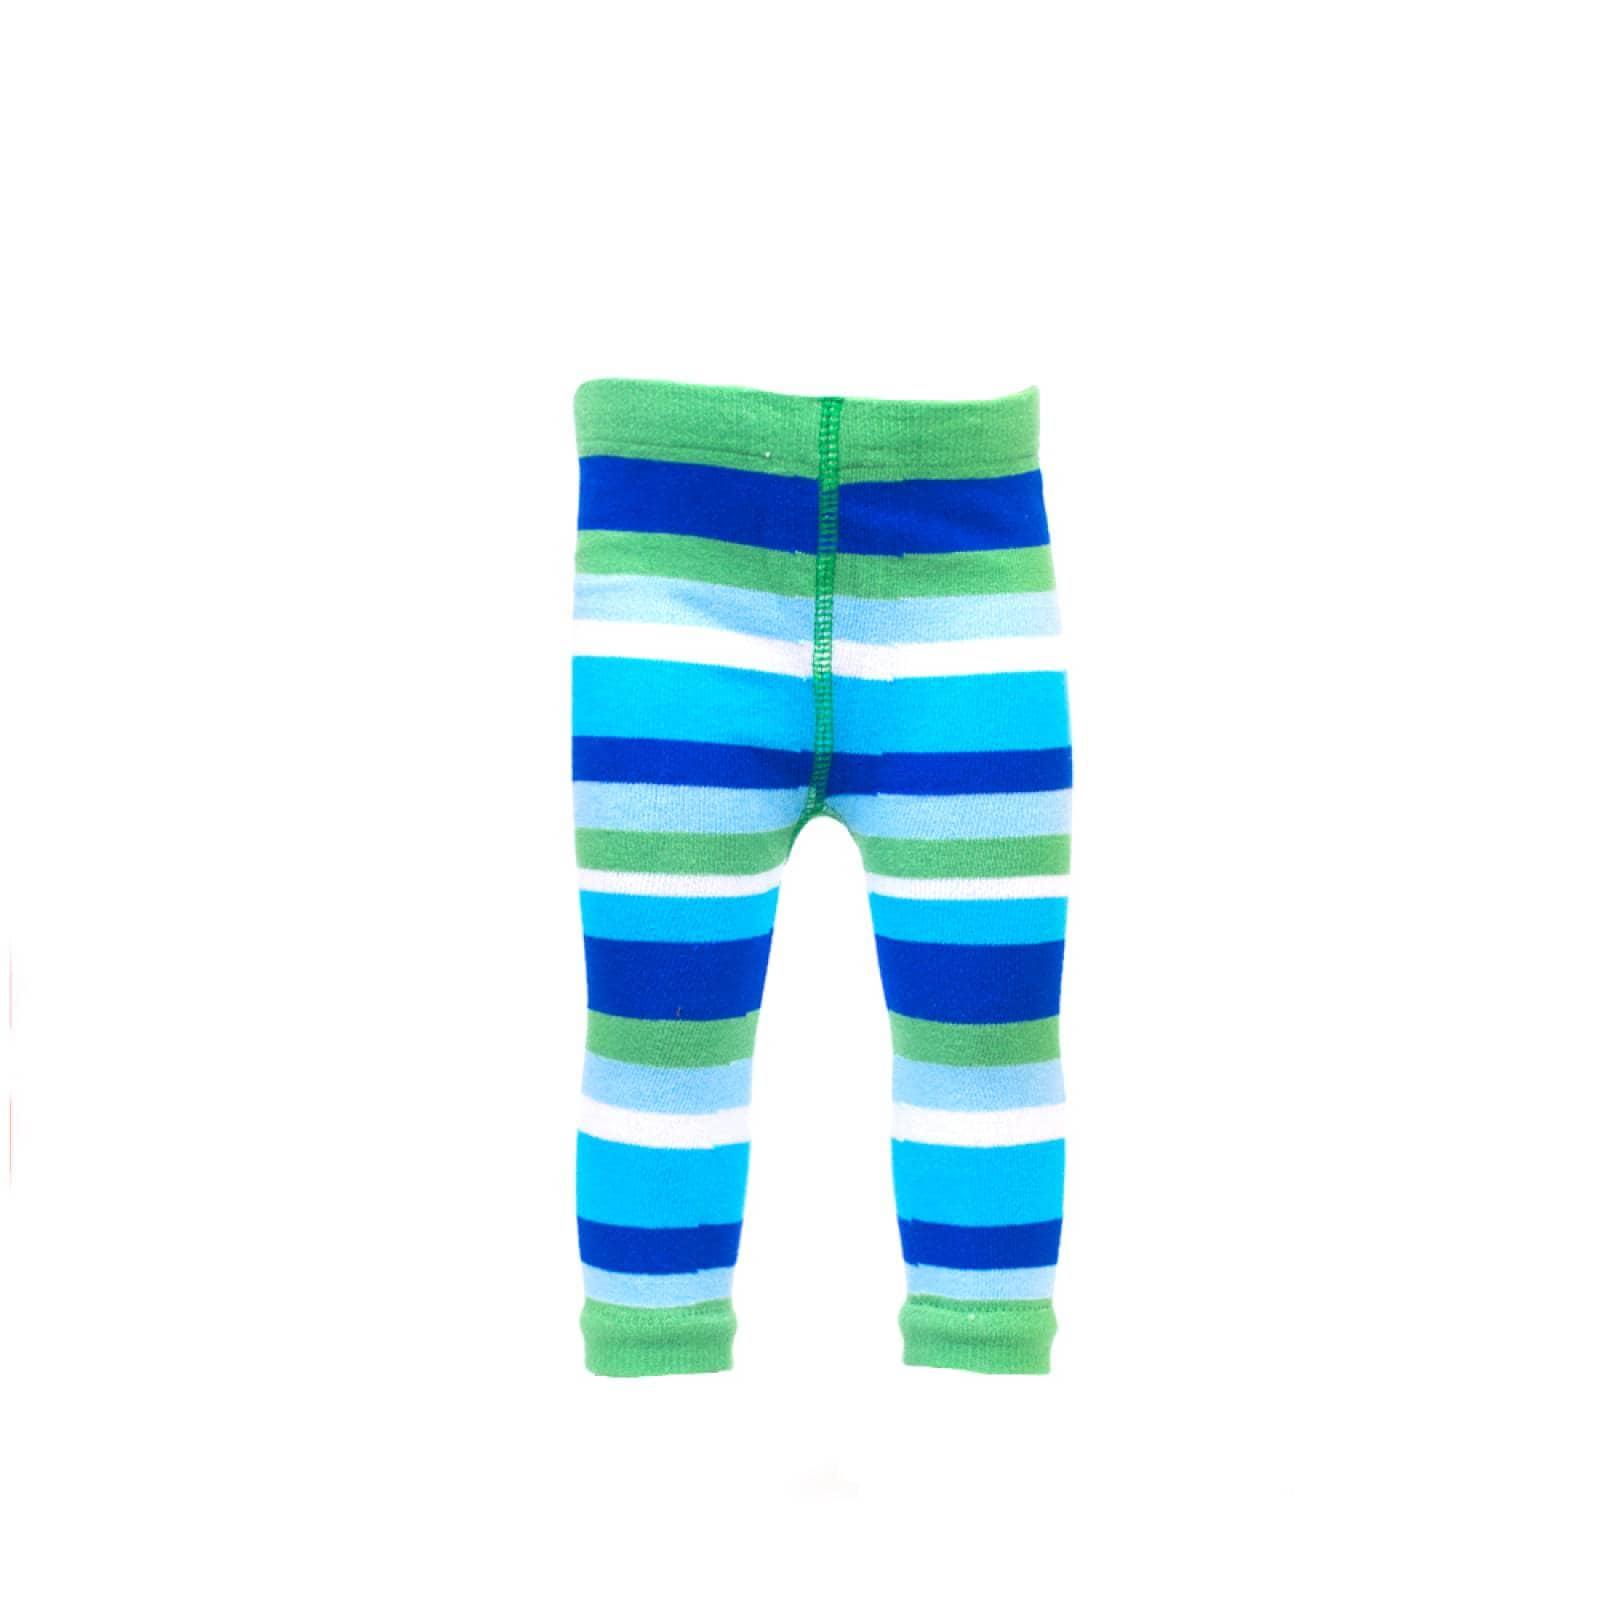 Legging Rayas Estampado Mounstrito algodón 24-36 Meses Baby room